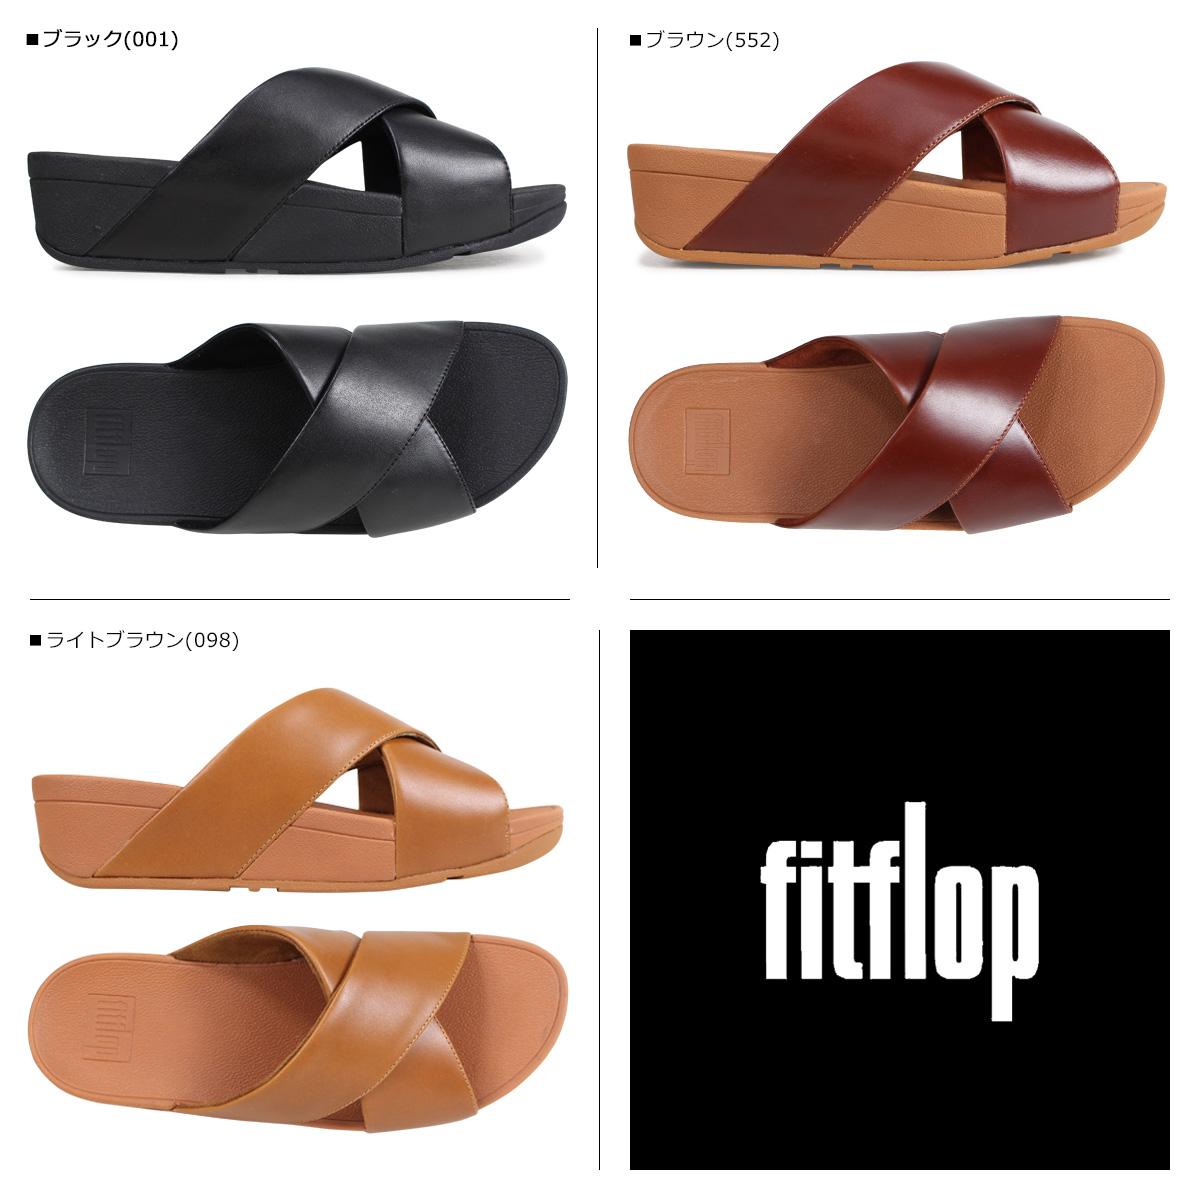 2c4c5f6d5 Fitting FLOP sandals FitFlop Lulu LULU CROSS SLIDE SANDALS Lady s K04 black  brown  4 4 Shinnyu load